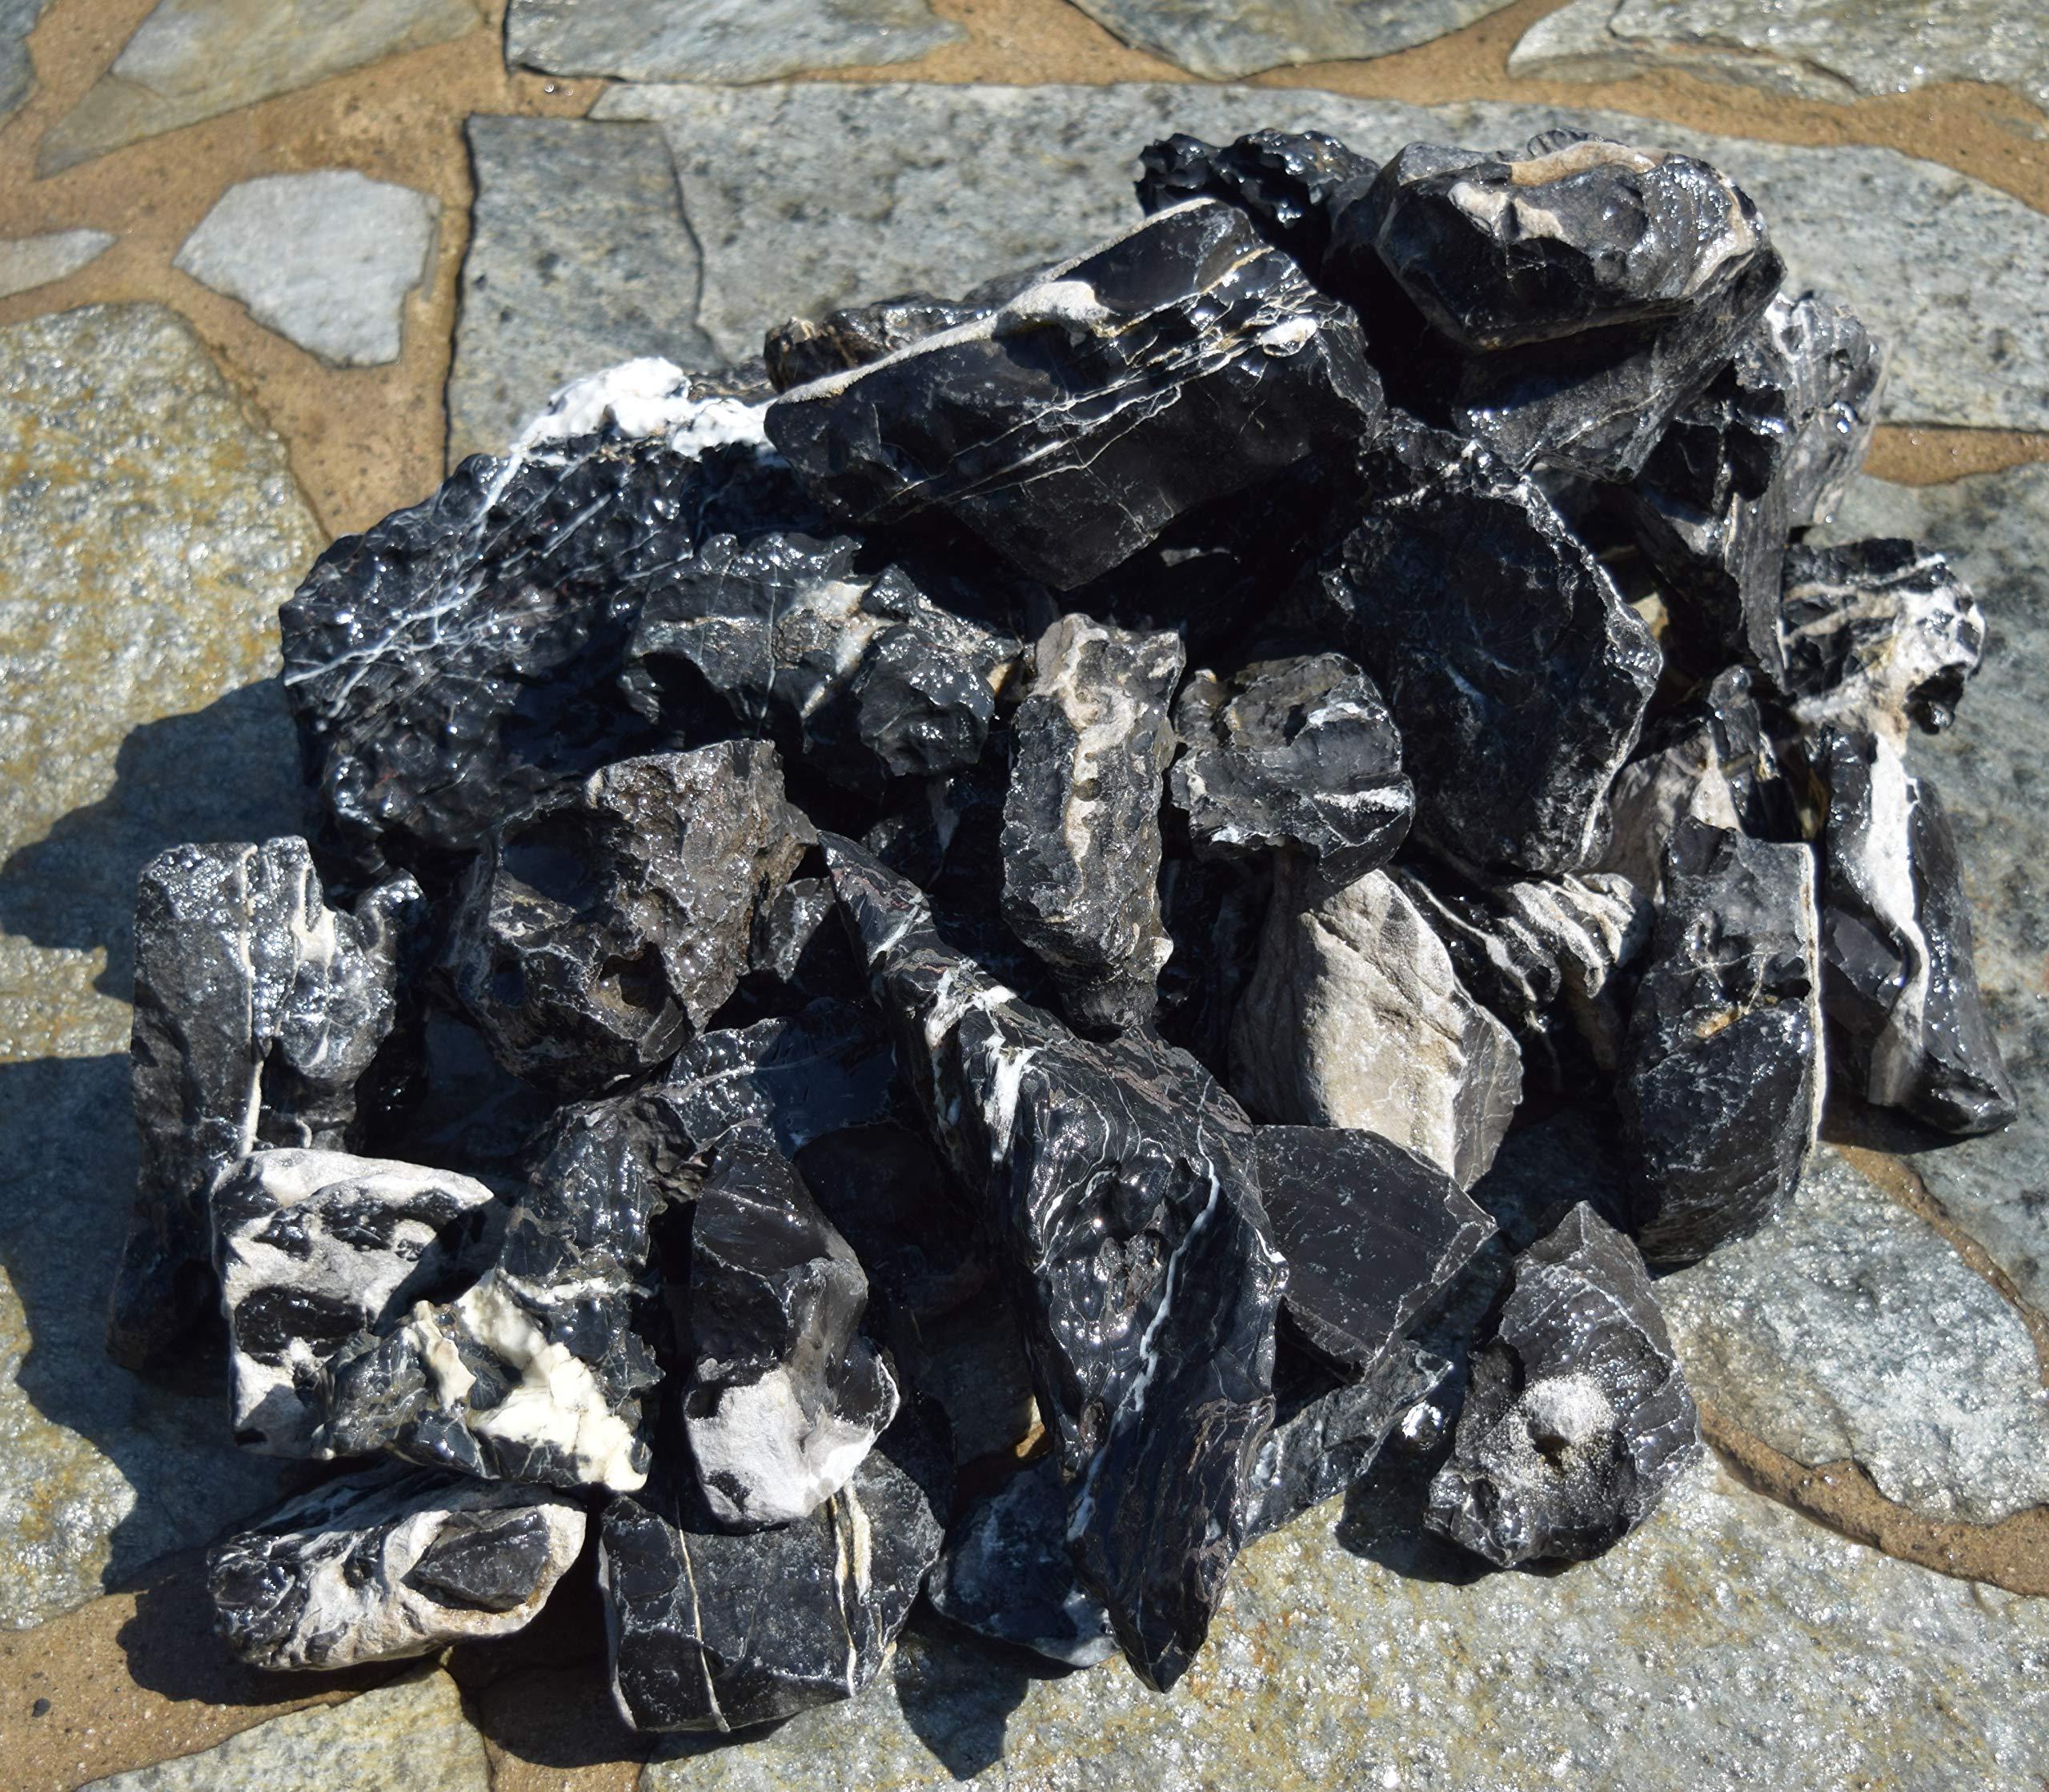 Manzanita Driftwood 20lb BlackSeiryu Stone by Manzanita Driftwood